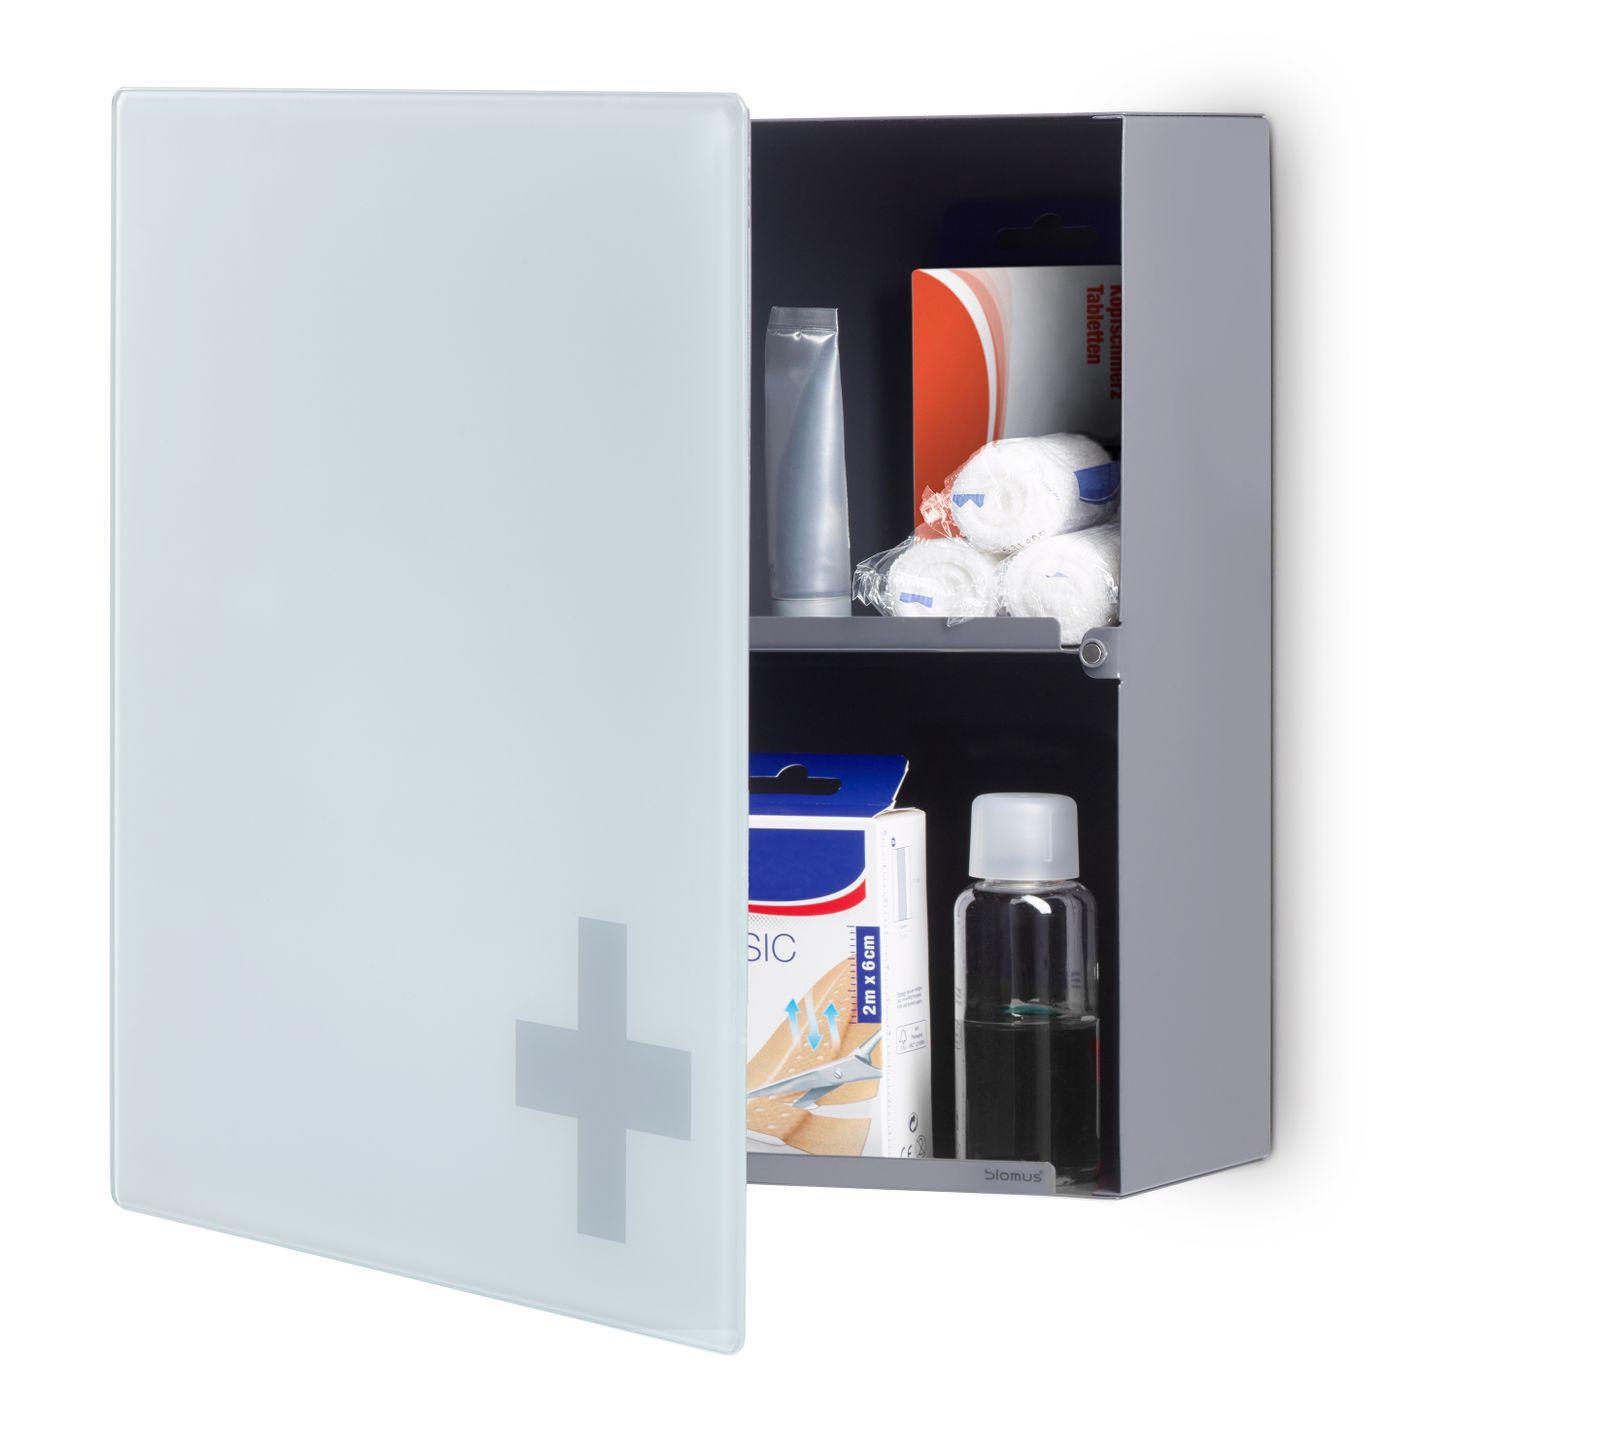 blomus erste hilfe schrank medico medizinschrank medikamentenschrank 68958 hersteller blomus. Black Bedroom Furniture Sets. Home Design Ideas